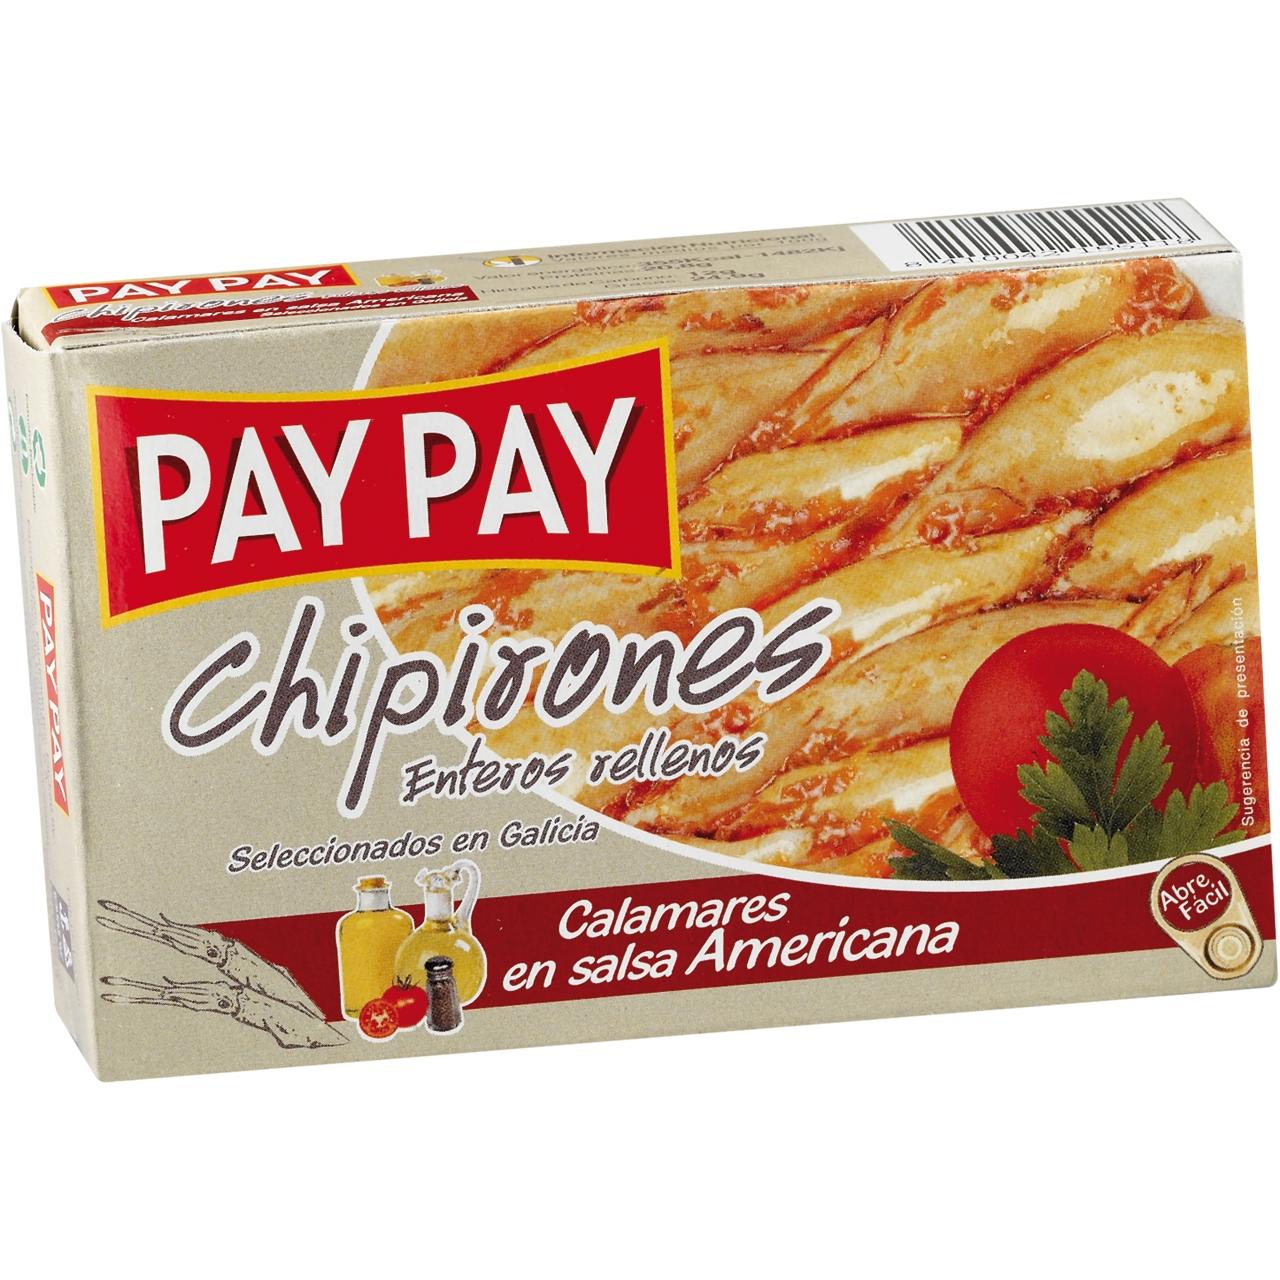 Calamarsets en salsa americana OL 120 F.O. Pay Pay